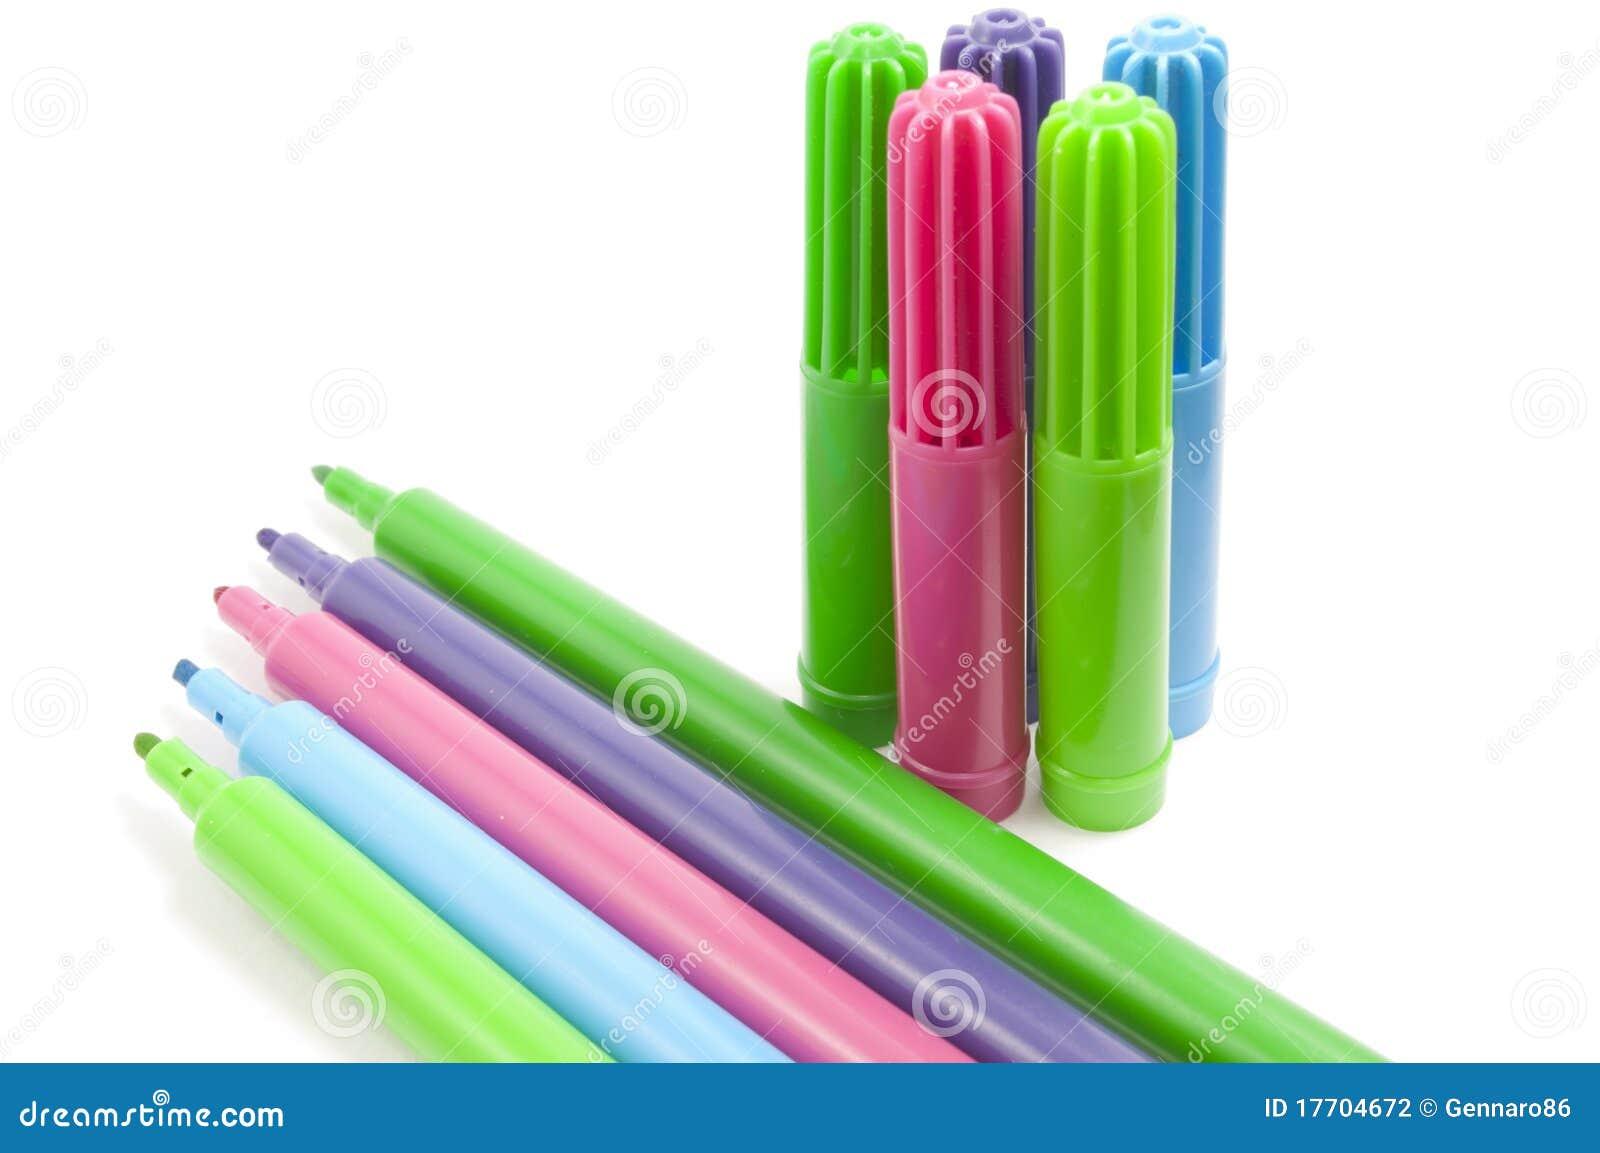 Coloured Felt-Tip